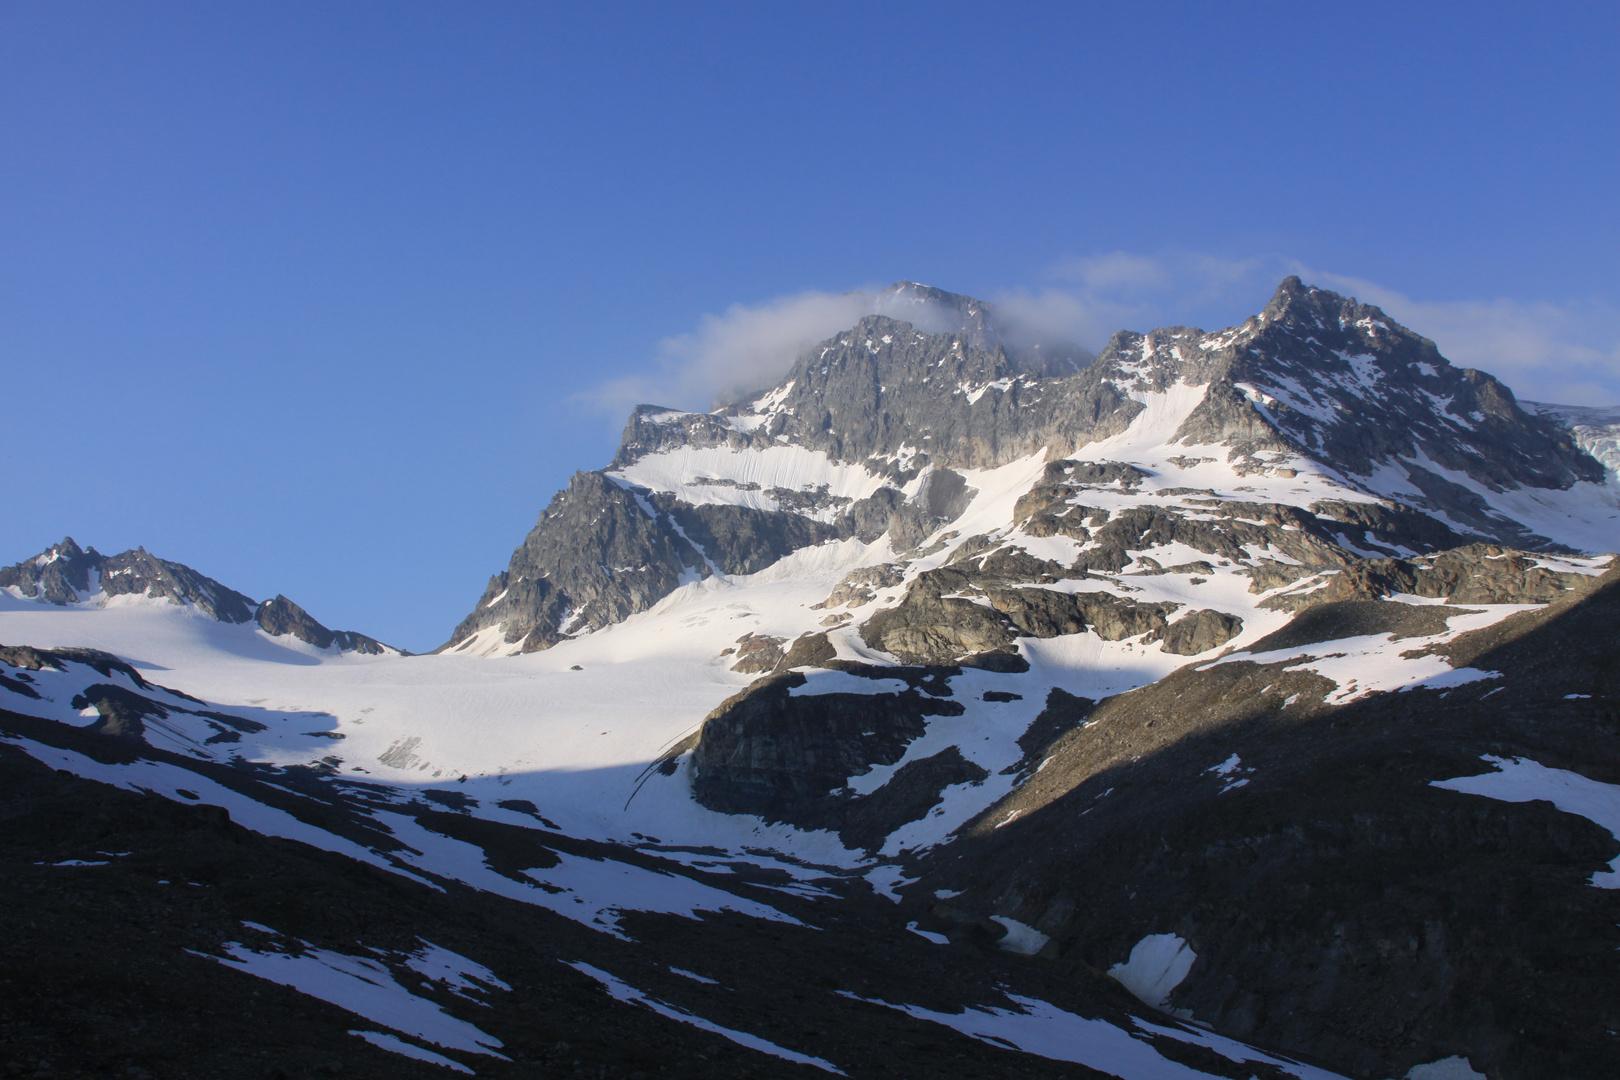 Großer Piz Buin /Silvretta, 3312m